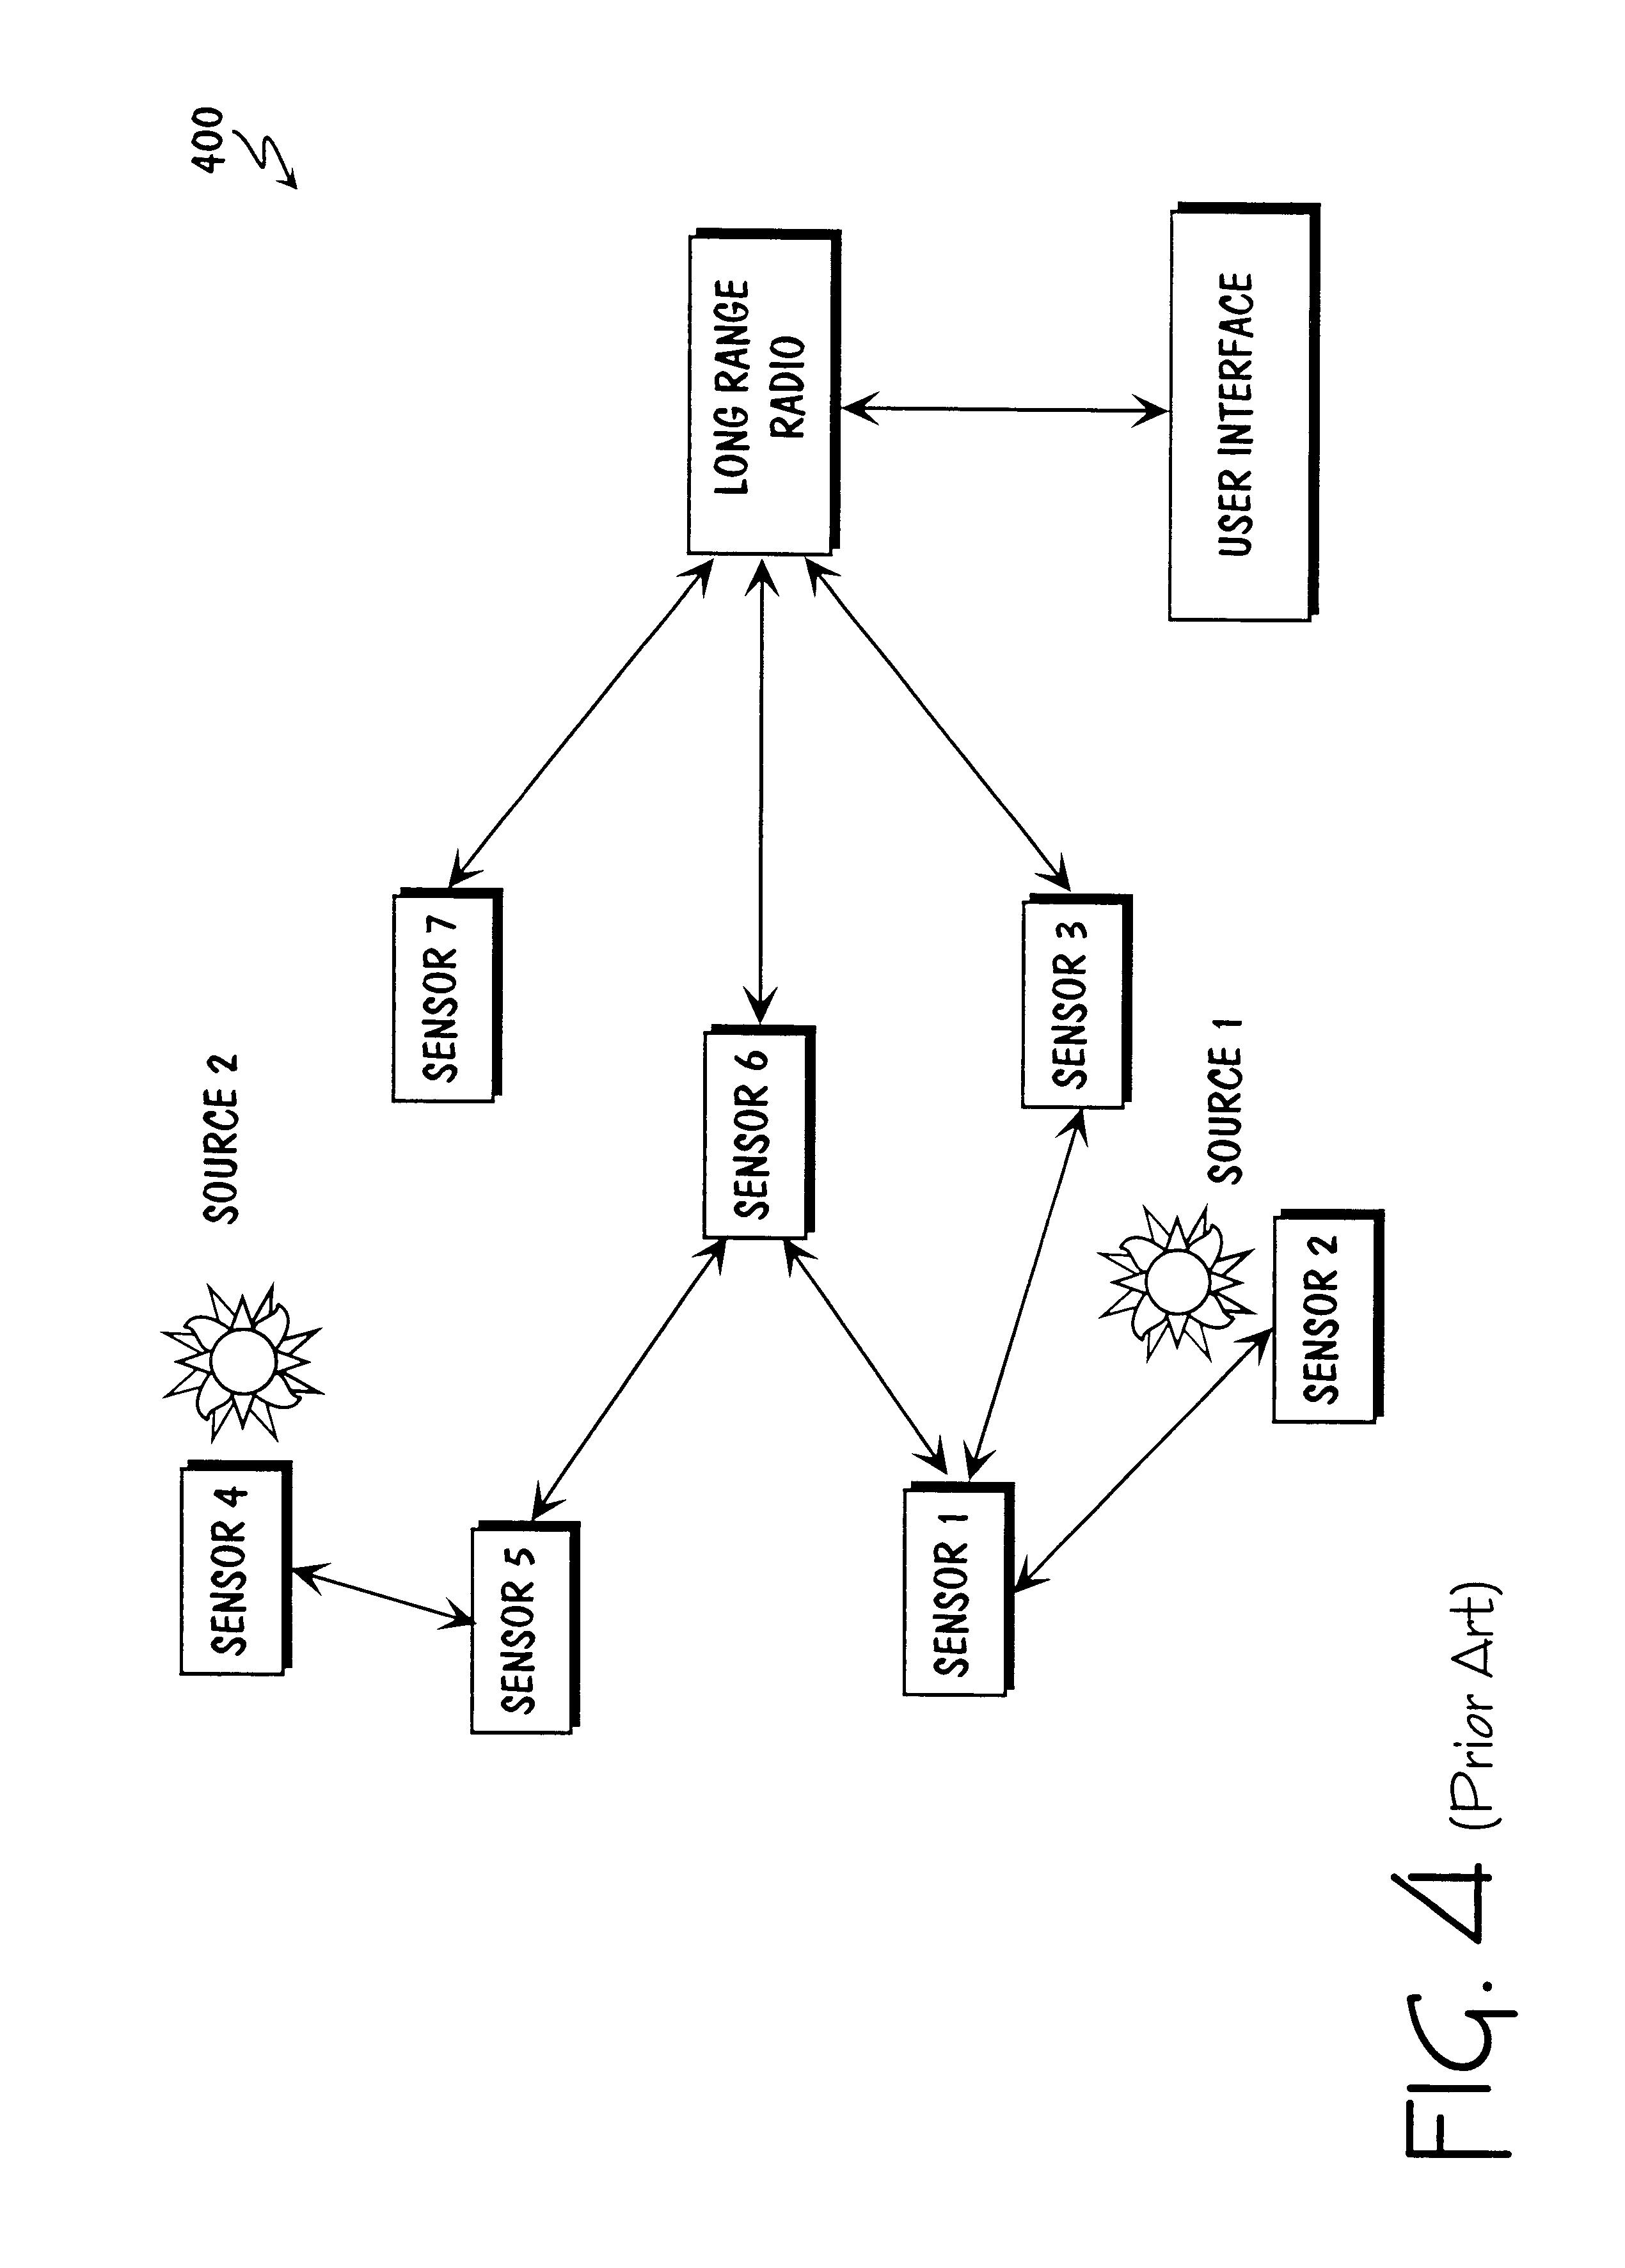 Patent Us 6859831 B1 Also Motion Sensor Block Diagram Moreover Wiring Guide Shock